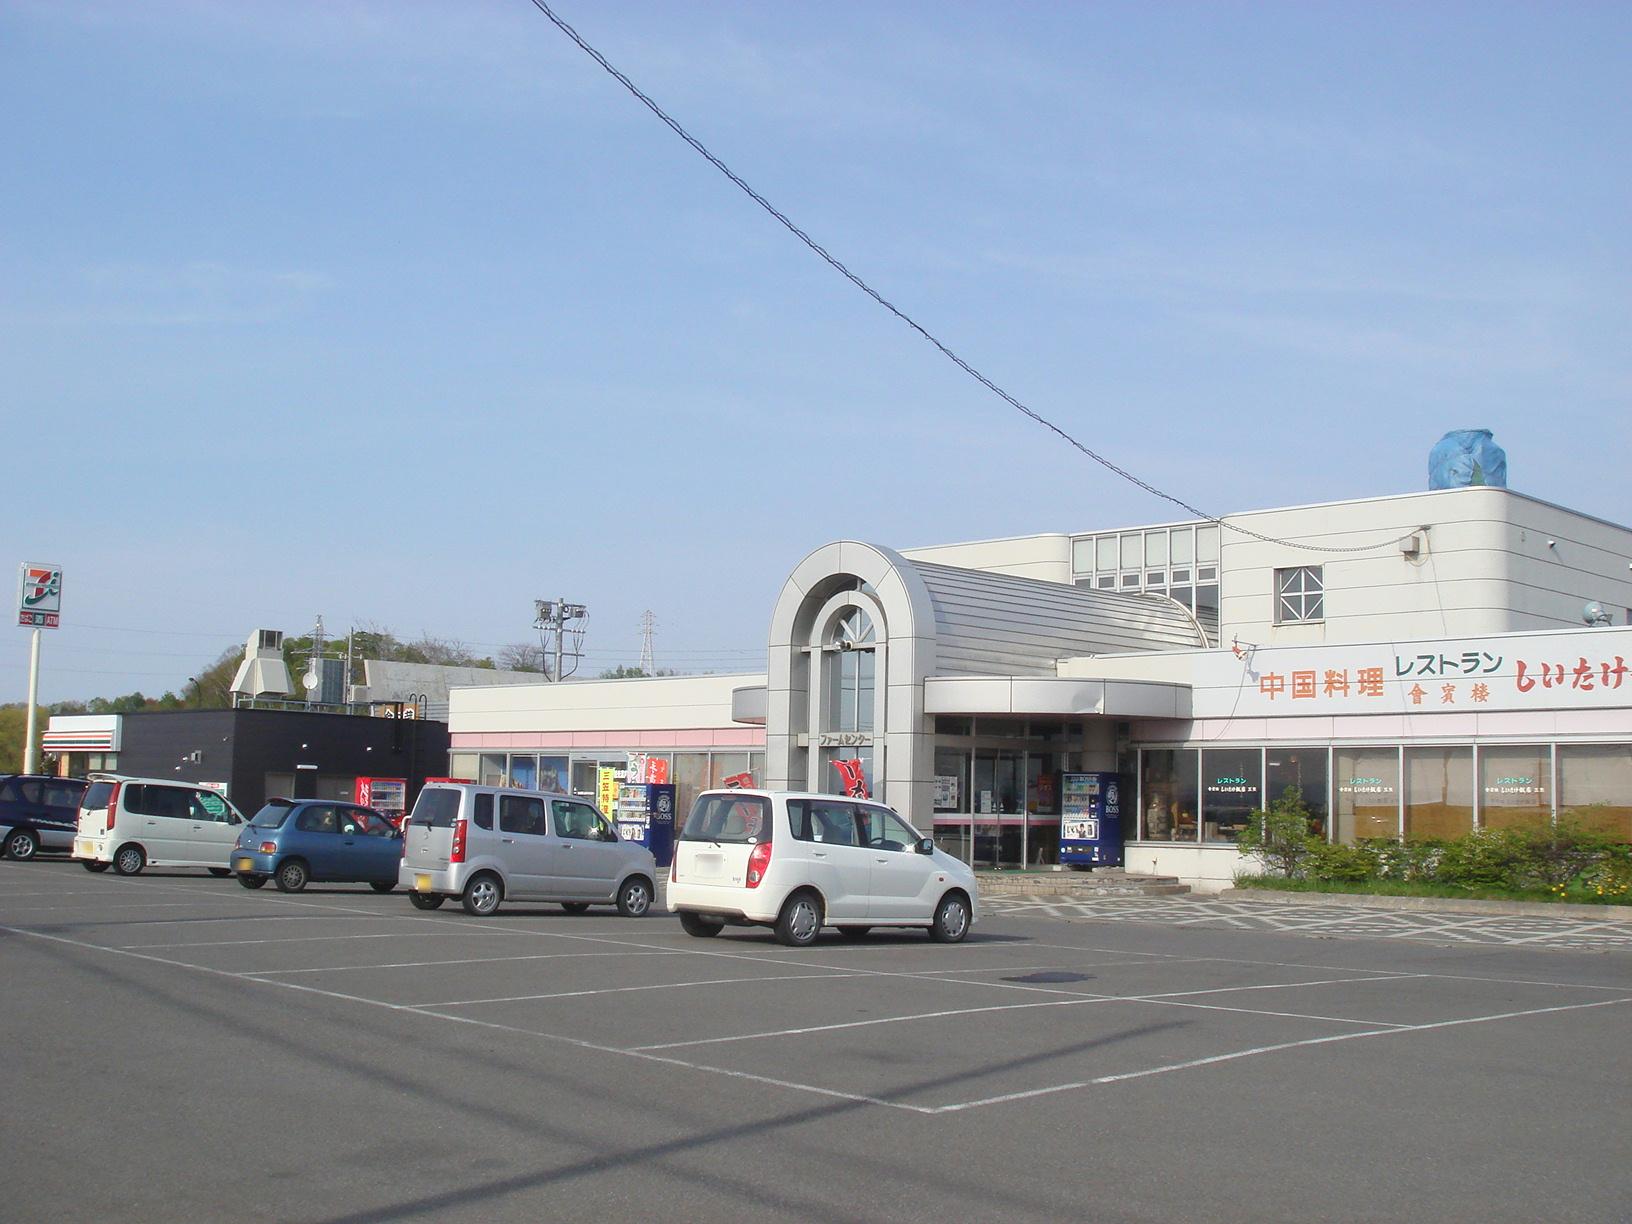 https://upload.wikimedia.org/wikipedia/commons/4/4a/Michinoeki_Mikasa.jpg